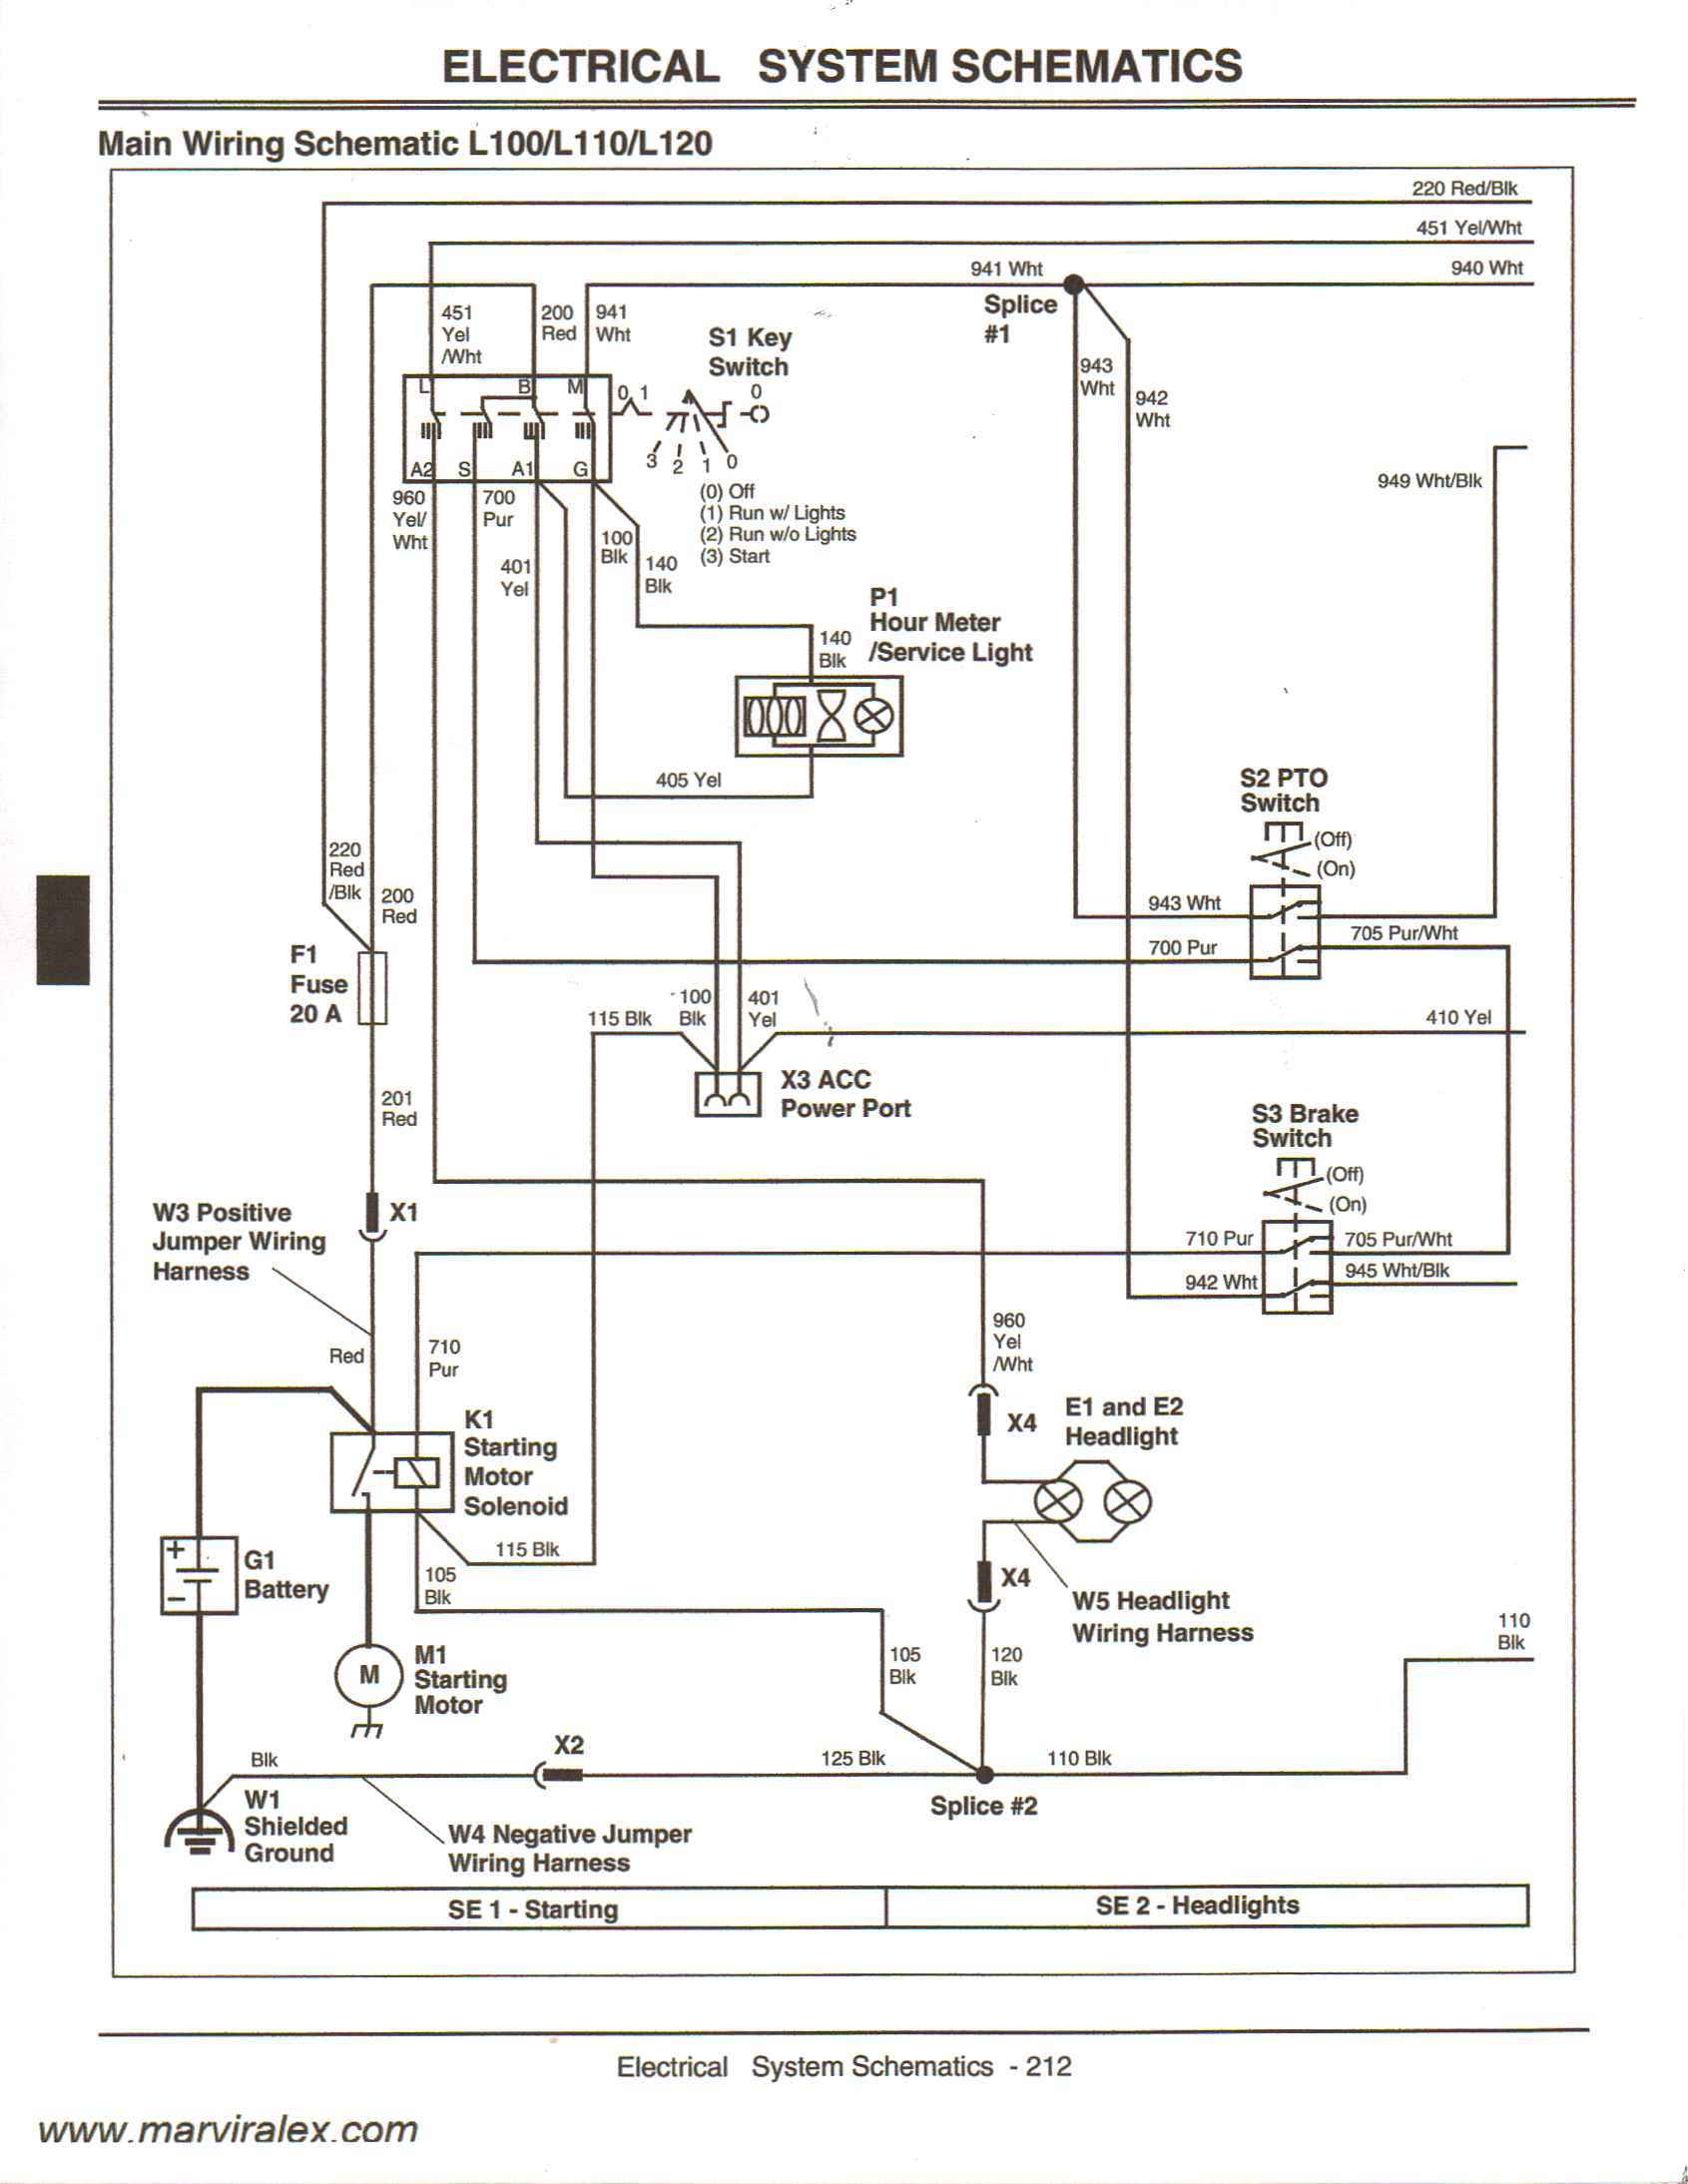 L120 Wiring Diagram - Data Wiring Diagram Schematic - John Deere L120 Wiring Diagram